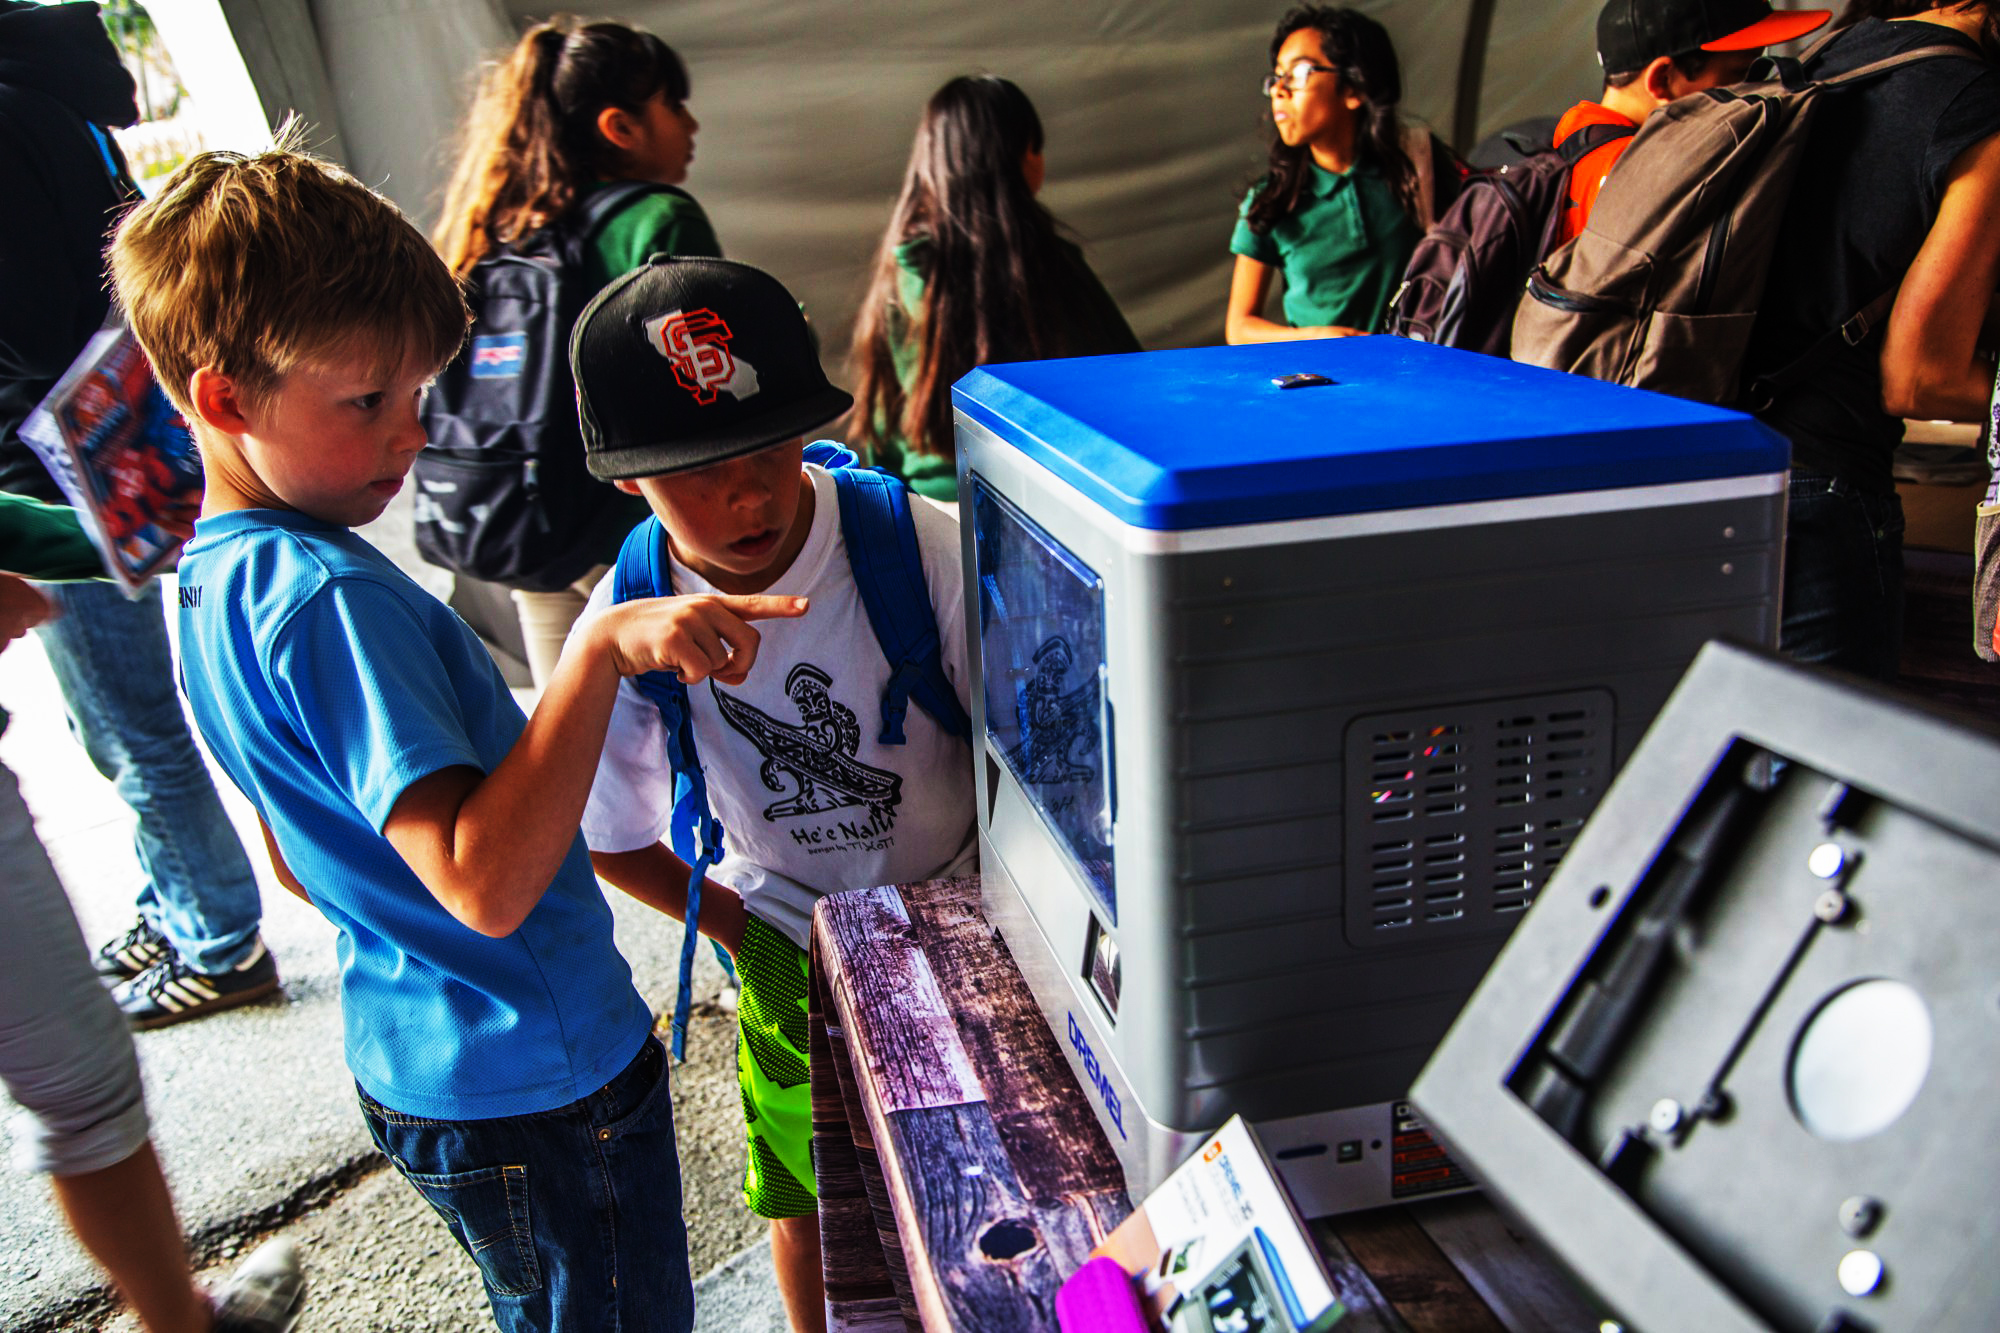 children_watch_3dprinting_at_dremel_booth_on_dremel-3dprinter